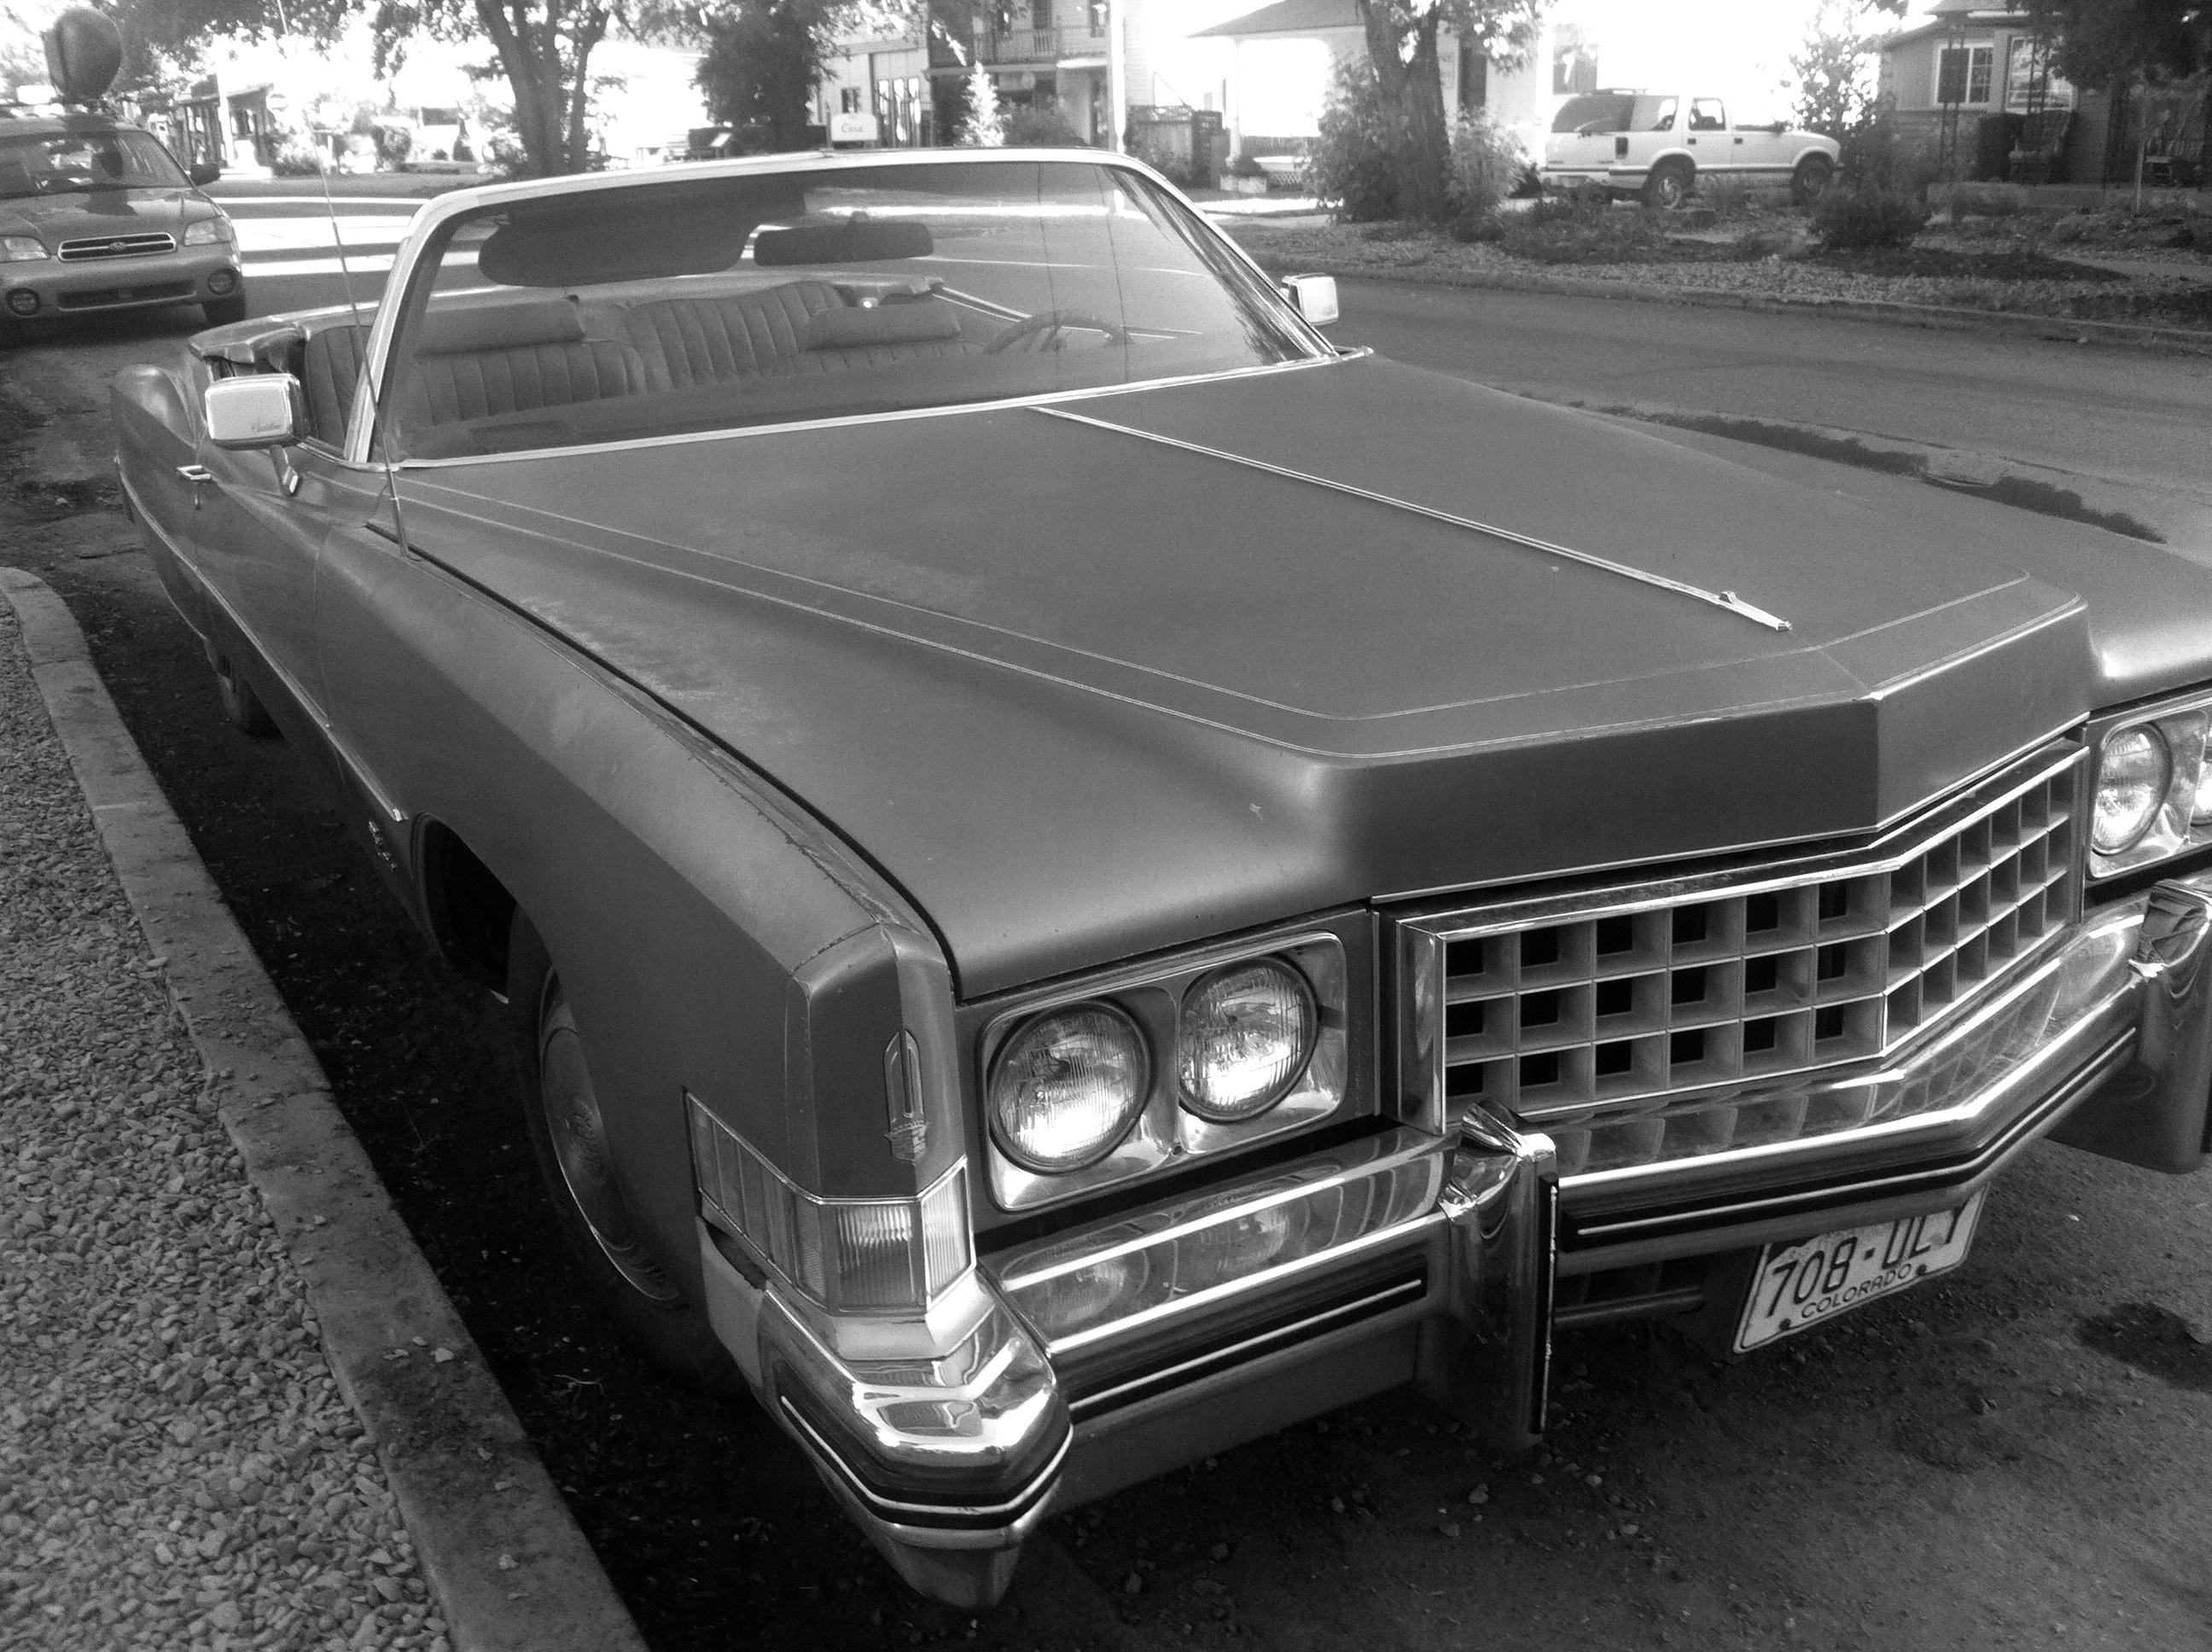 Free Images : classic car, sedan, odyssey, hurleylounge, antique car ...